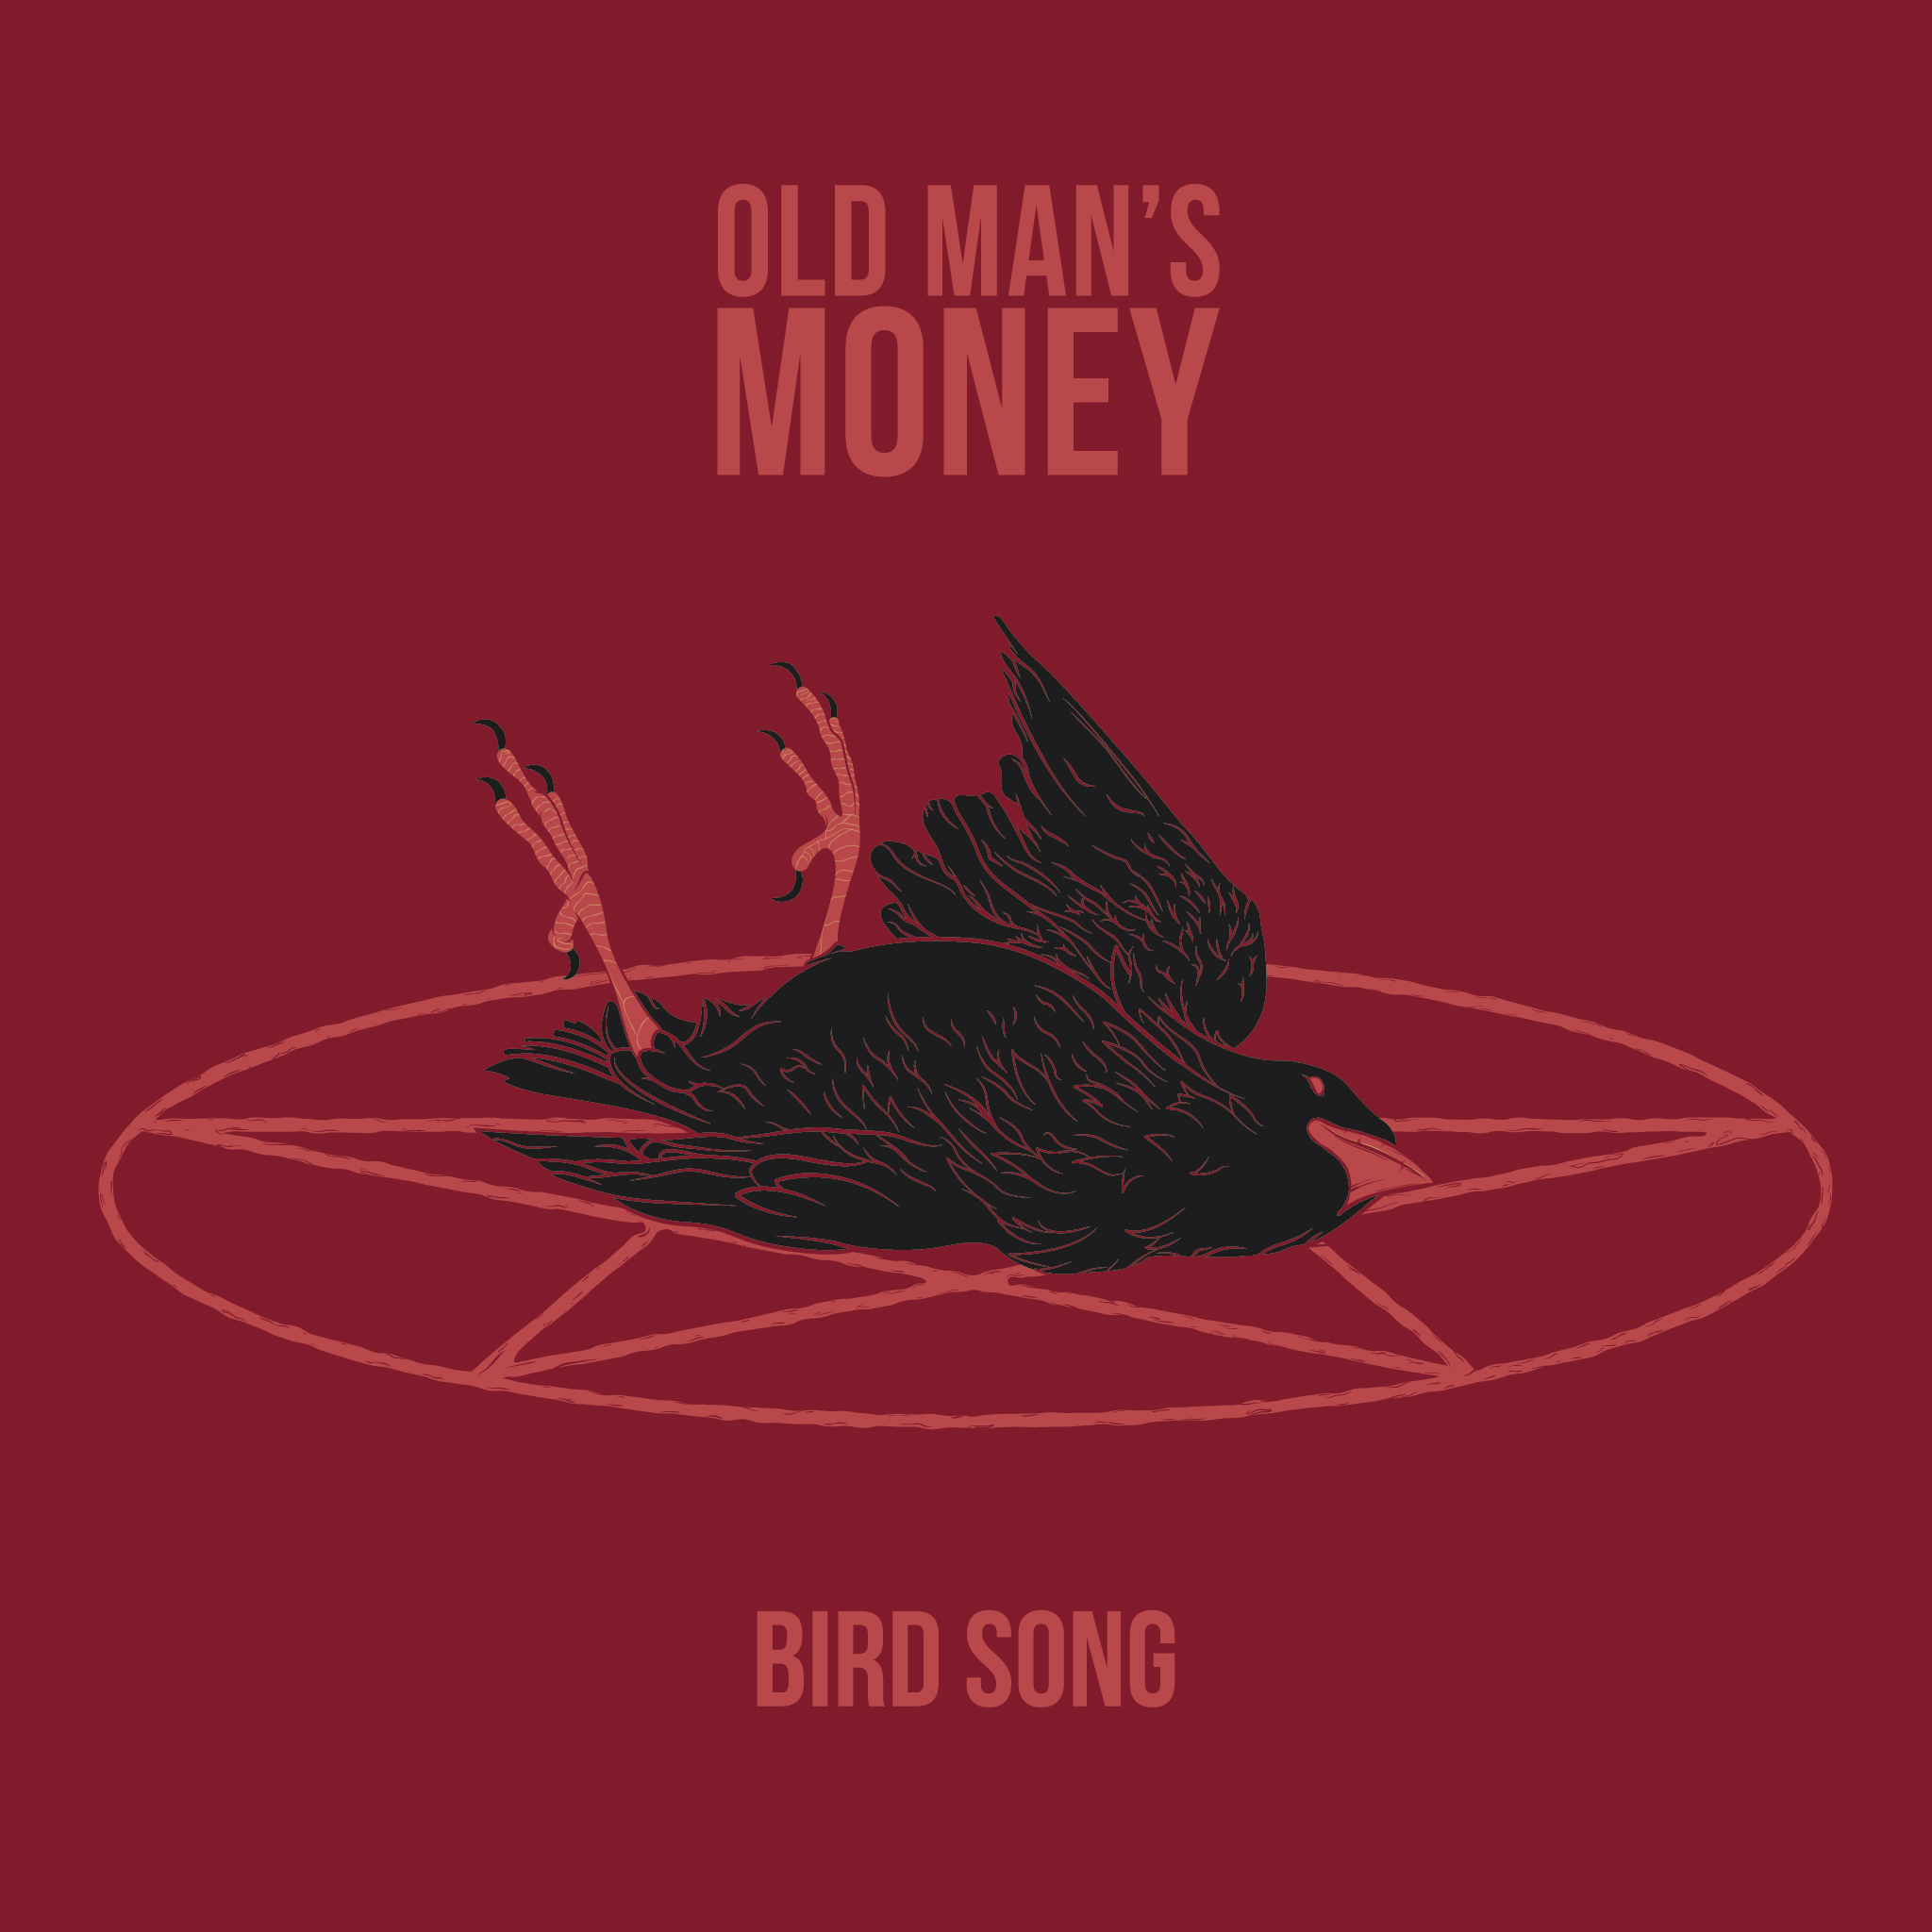 Old Man's Money - Bird Song